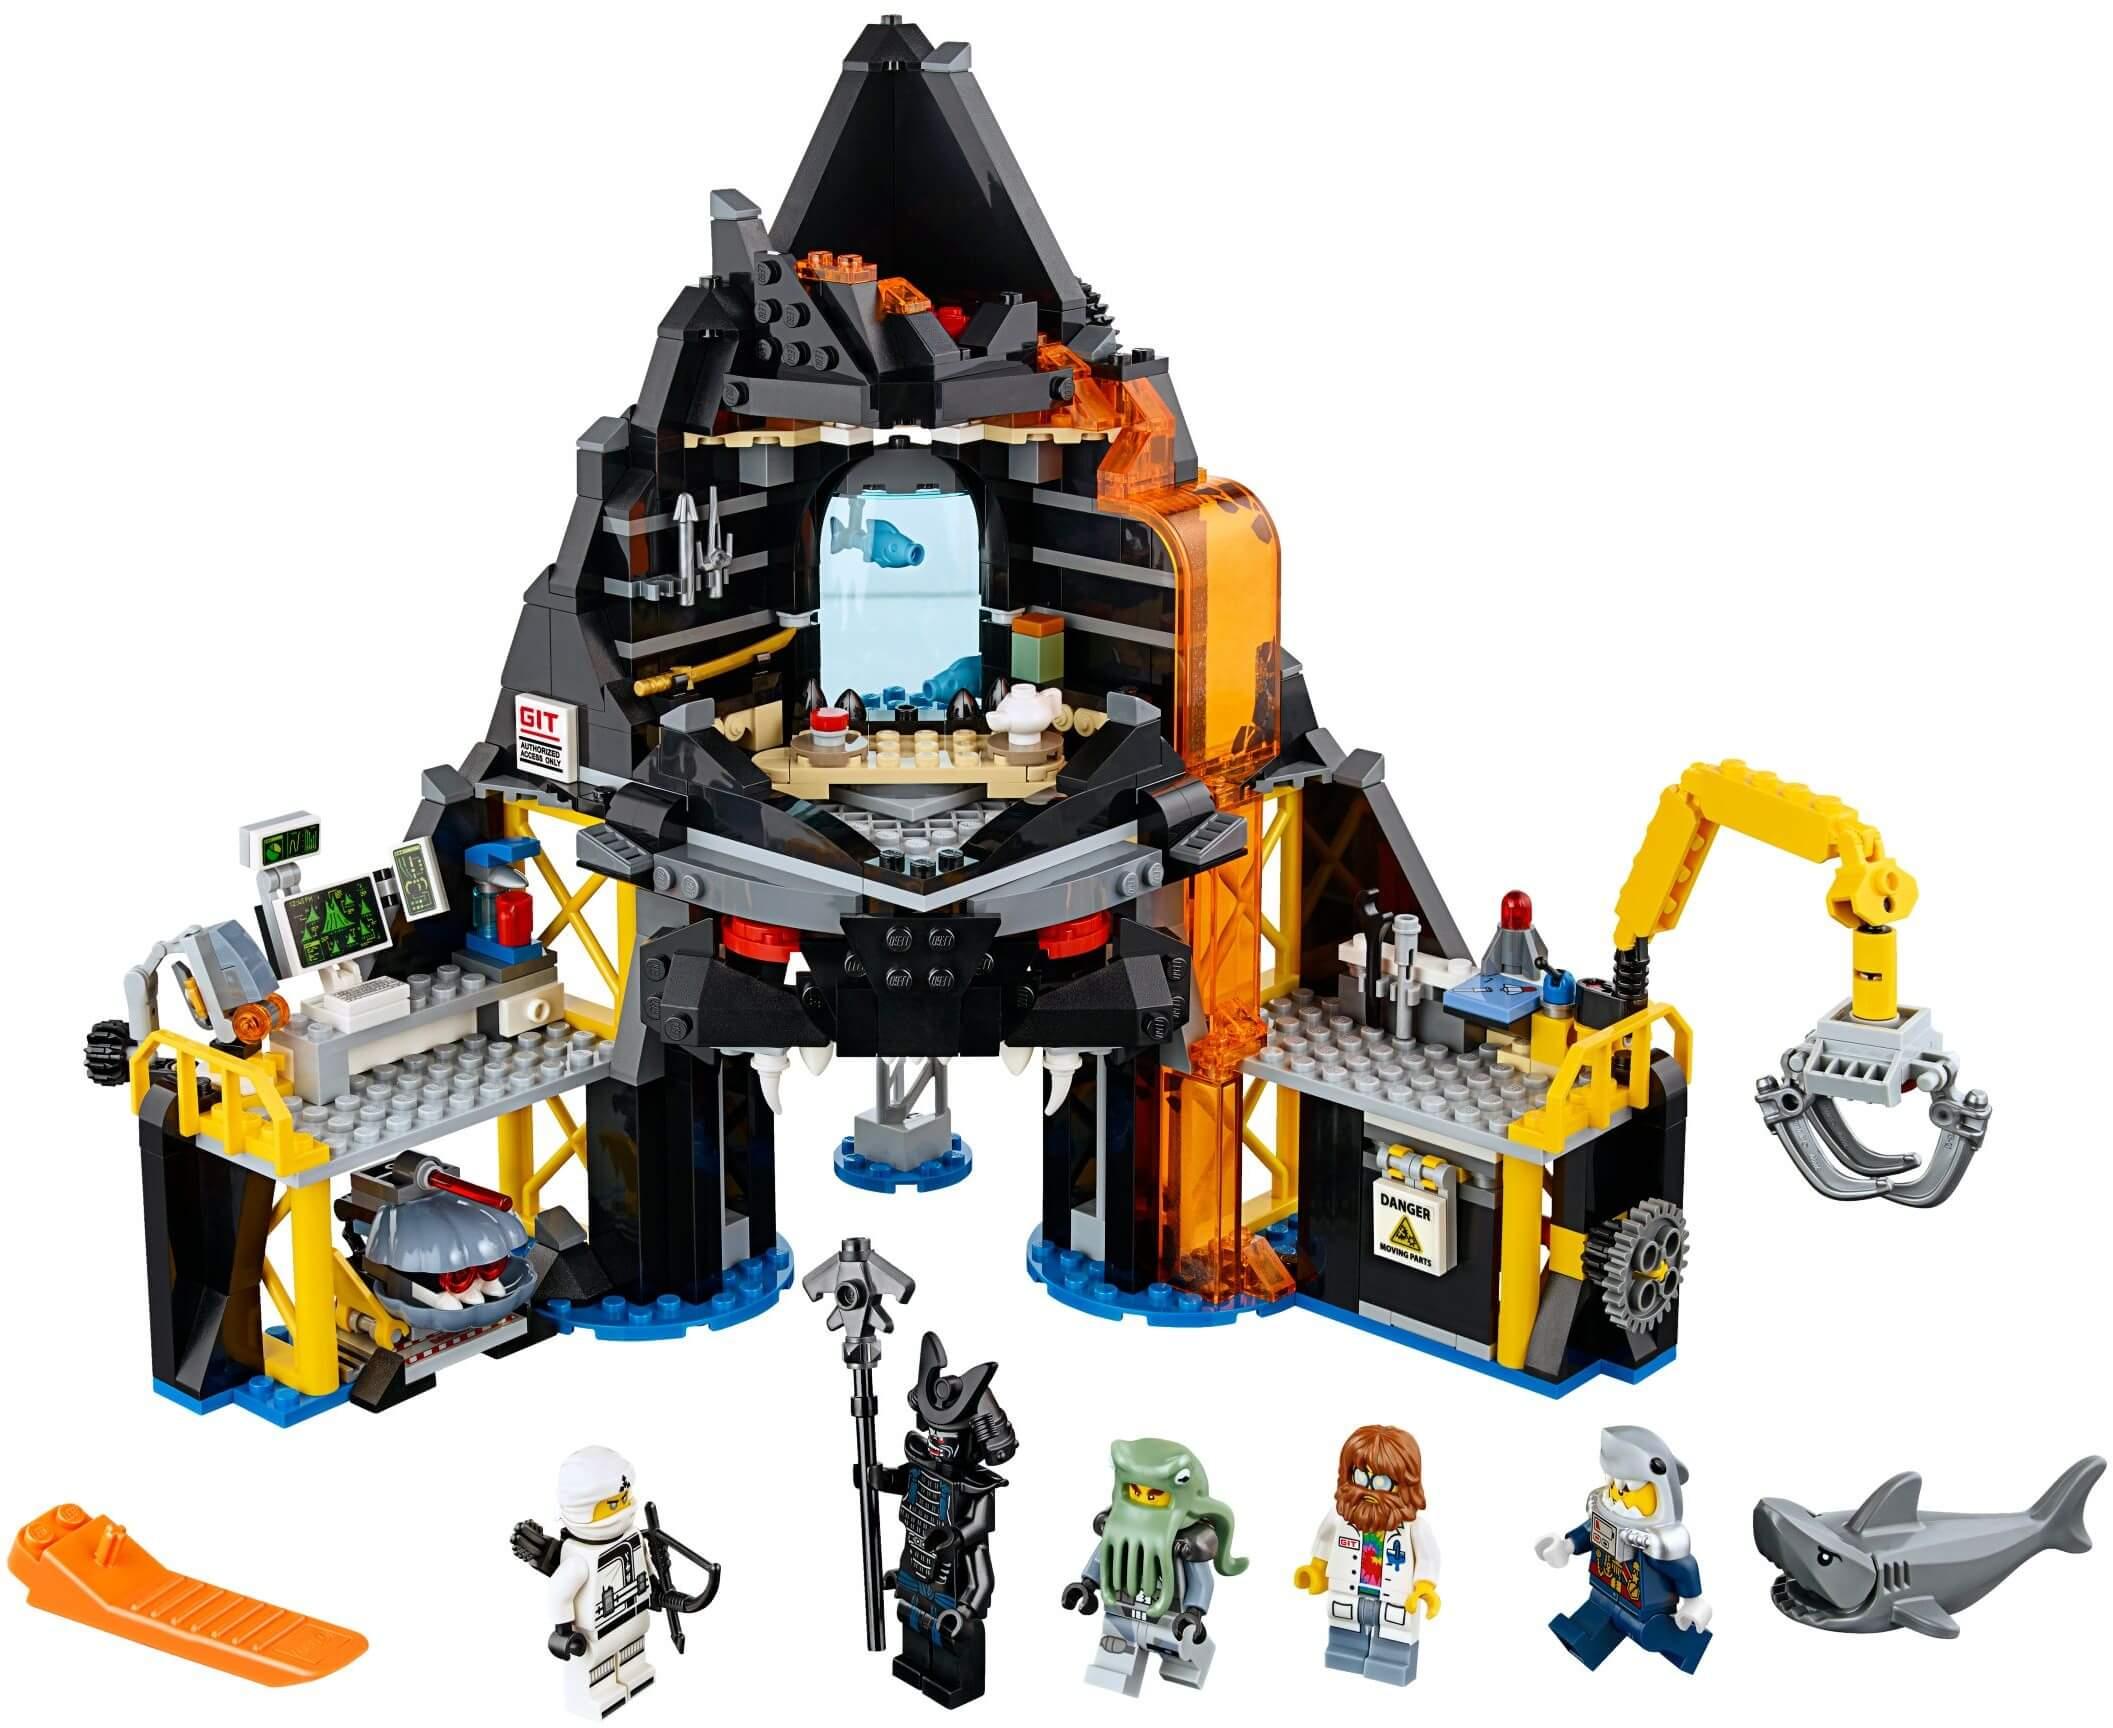 Mua đồ chơi LEGO 70631 - LEGO Ninjago 70631 - Pháo Đài Nham Thạch của Garmadon (LEGO Ninjago 70631 Garmadon's Volcano Lair)